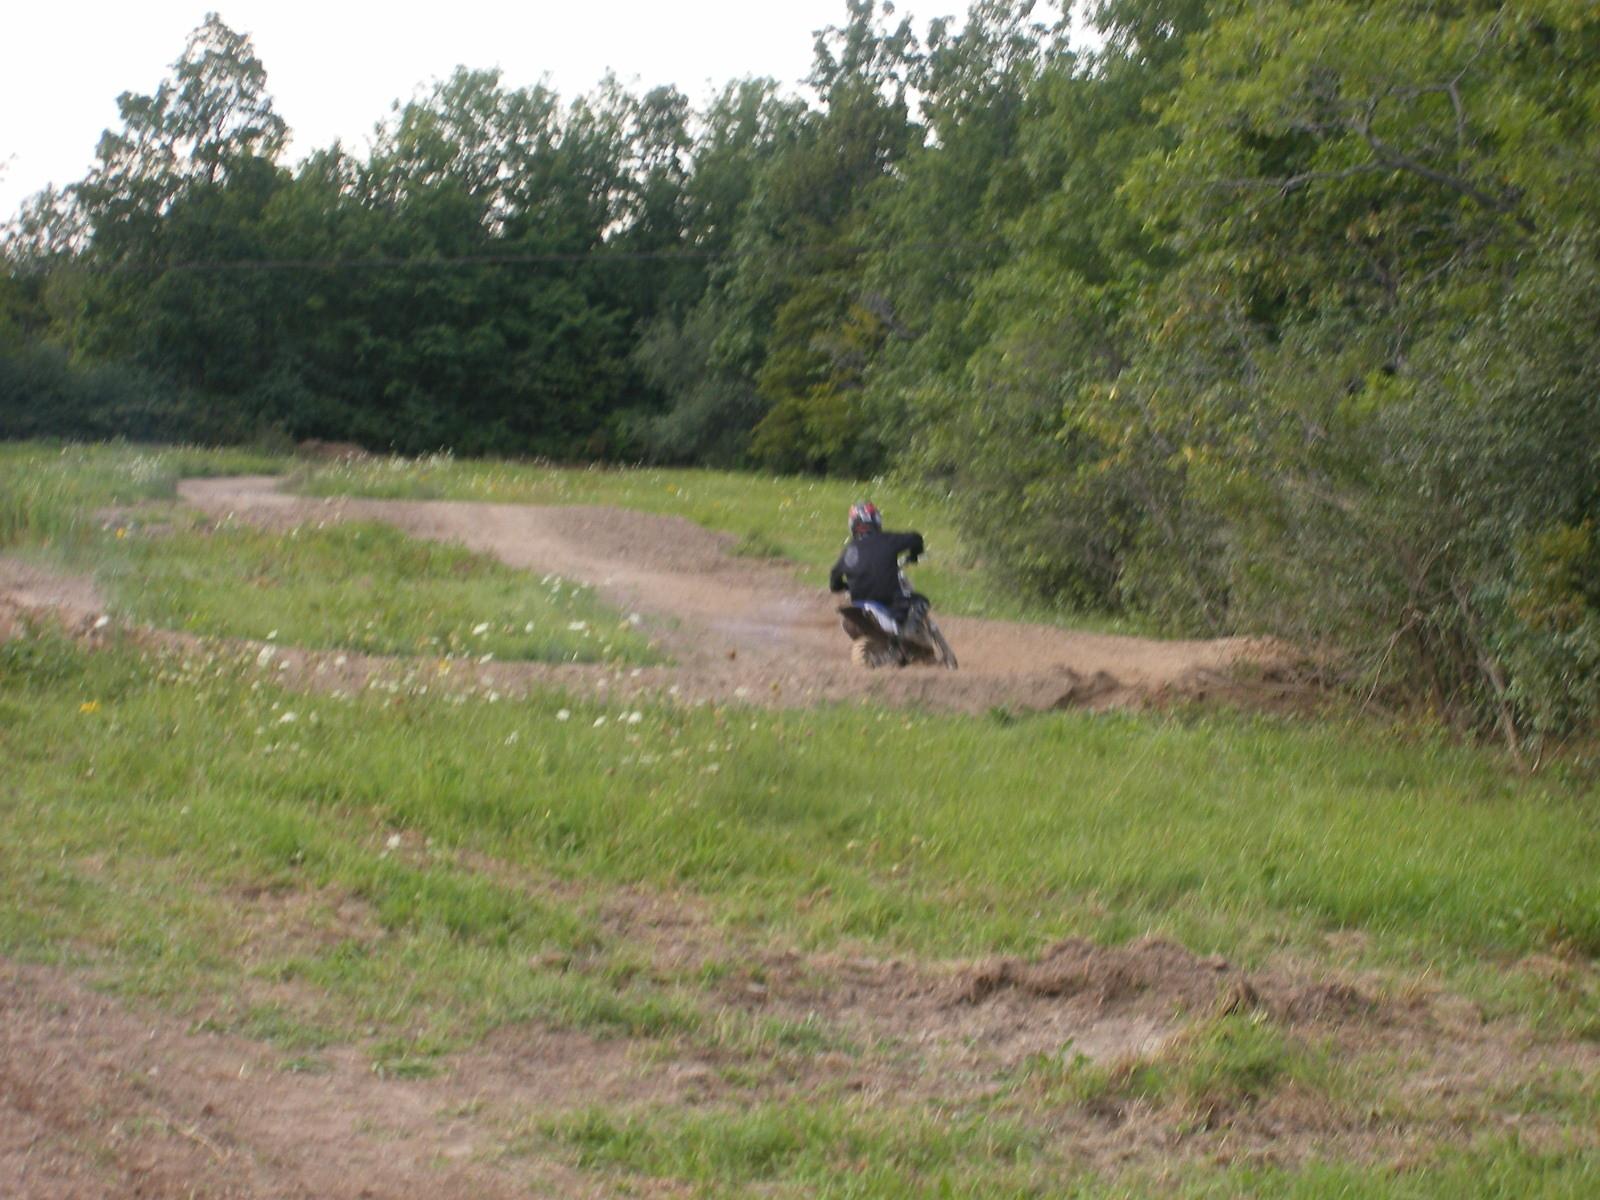 hole shot - hole shot - Motocross Pictures - Vital MX